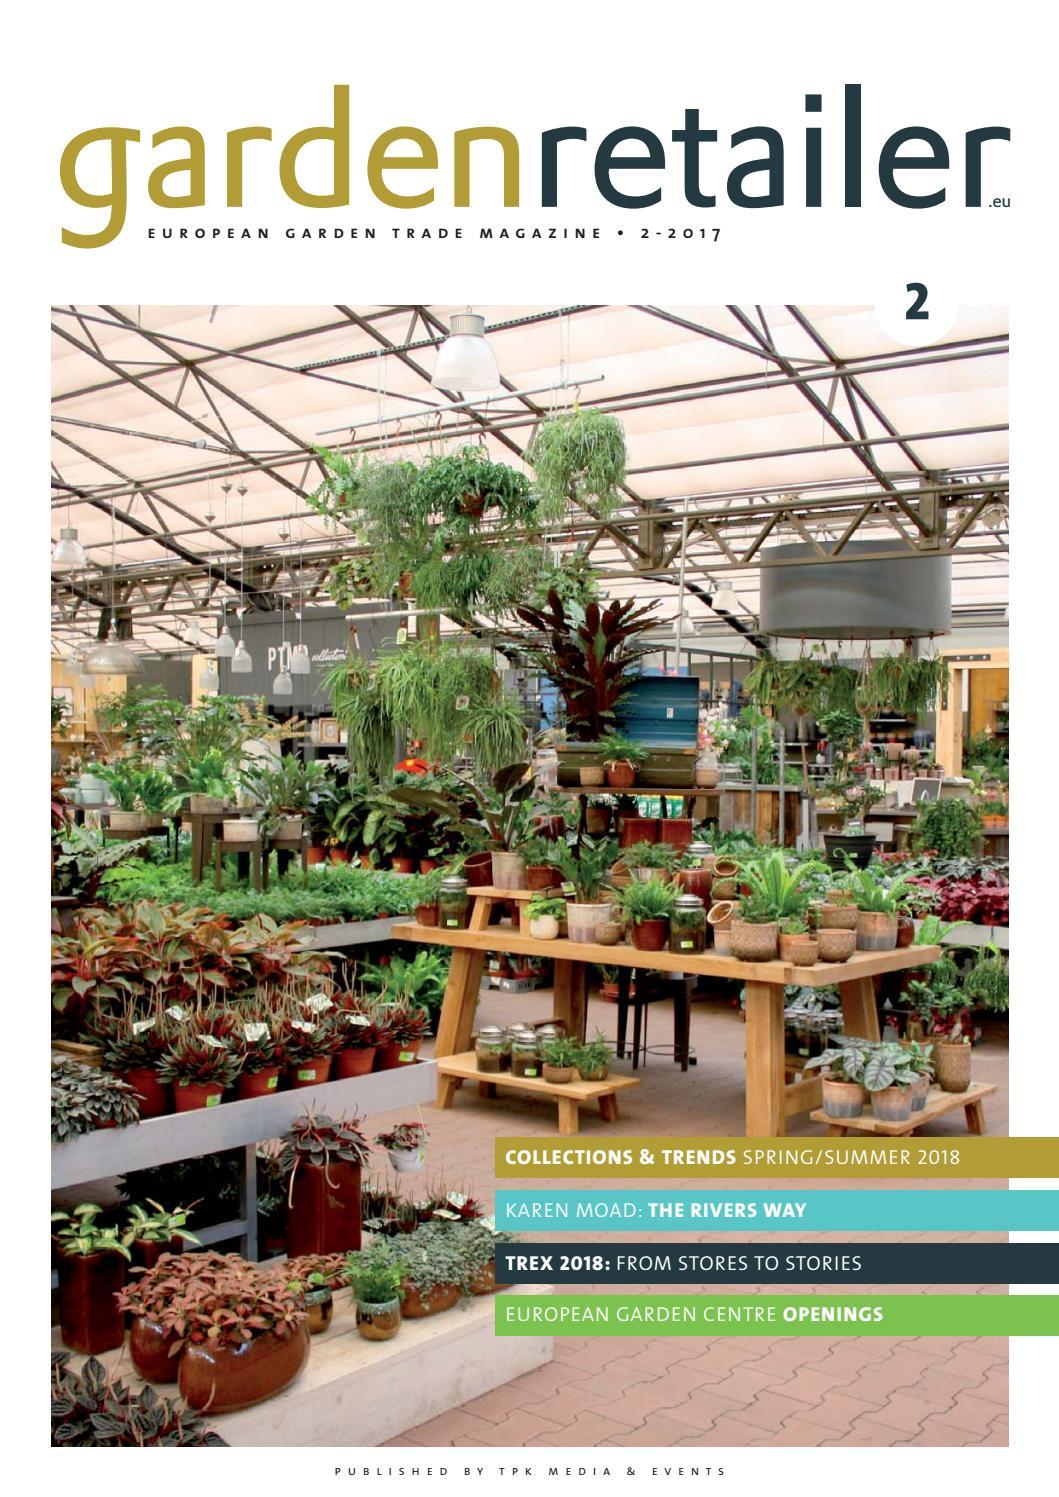 Garten solar Deko Neu Garden Retailer 02 17 by Tpk Media & events issuu